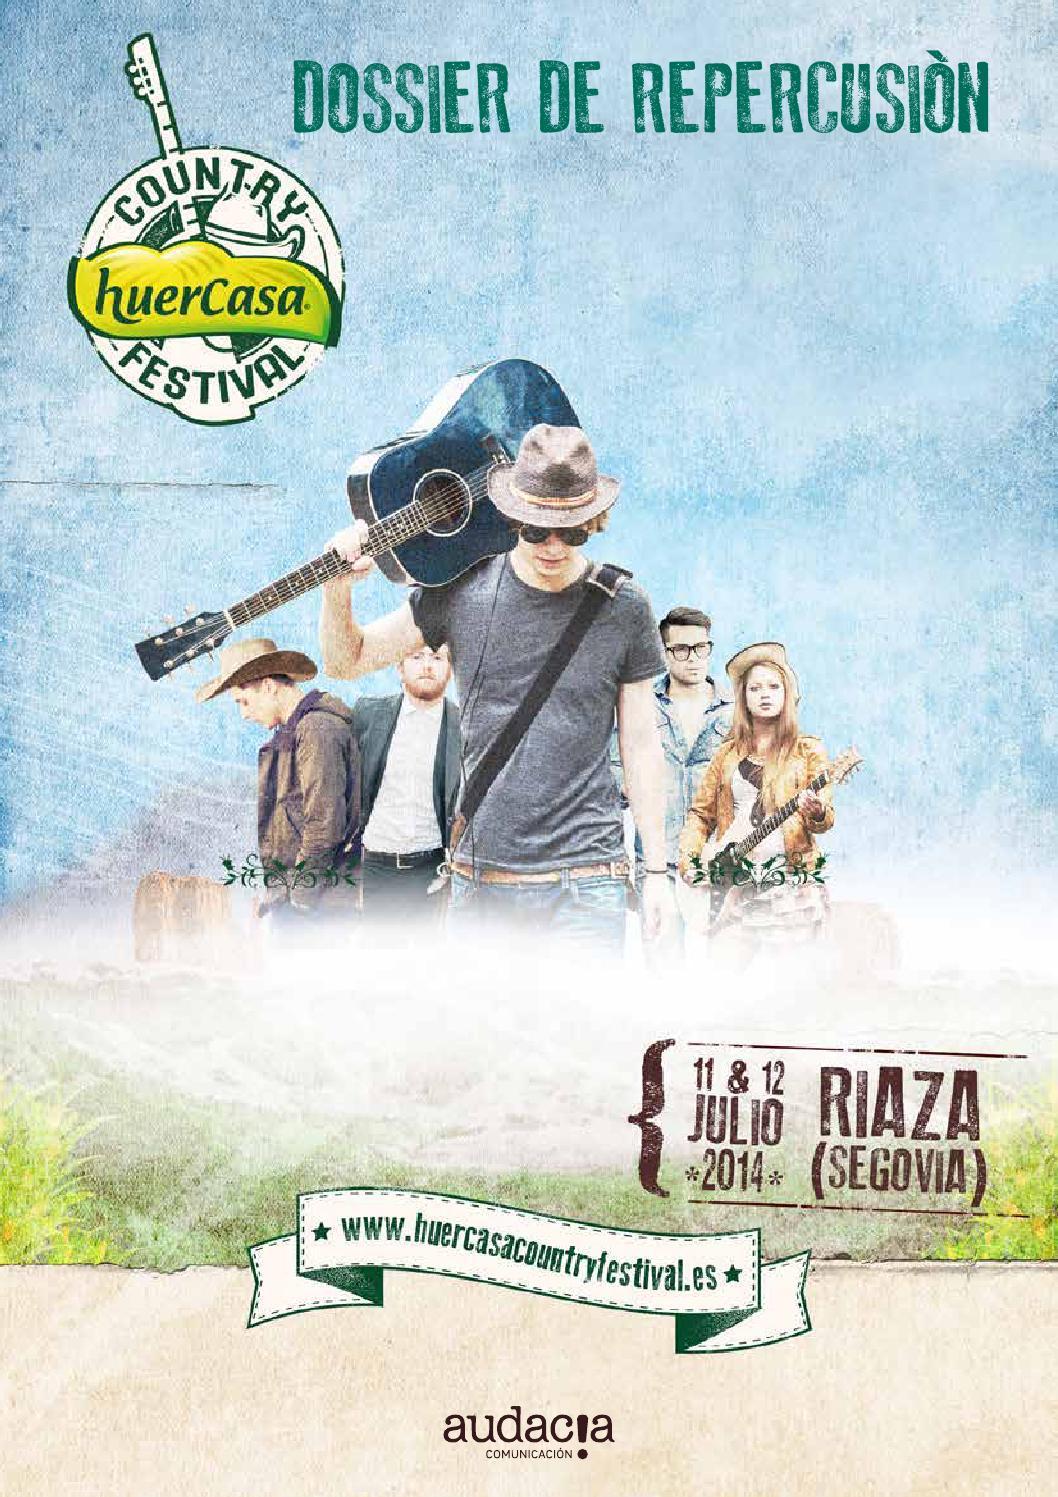 Repercusi N Medi Tica Huercasa Country Festival By Huercasa  # Recogida Muebles Nigran